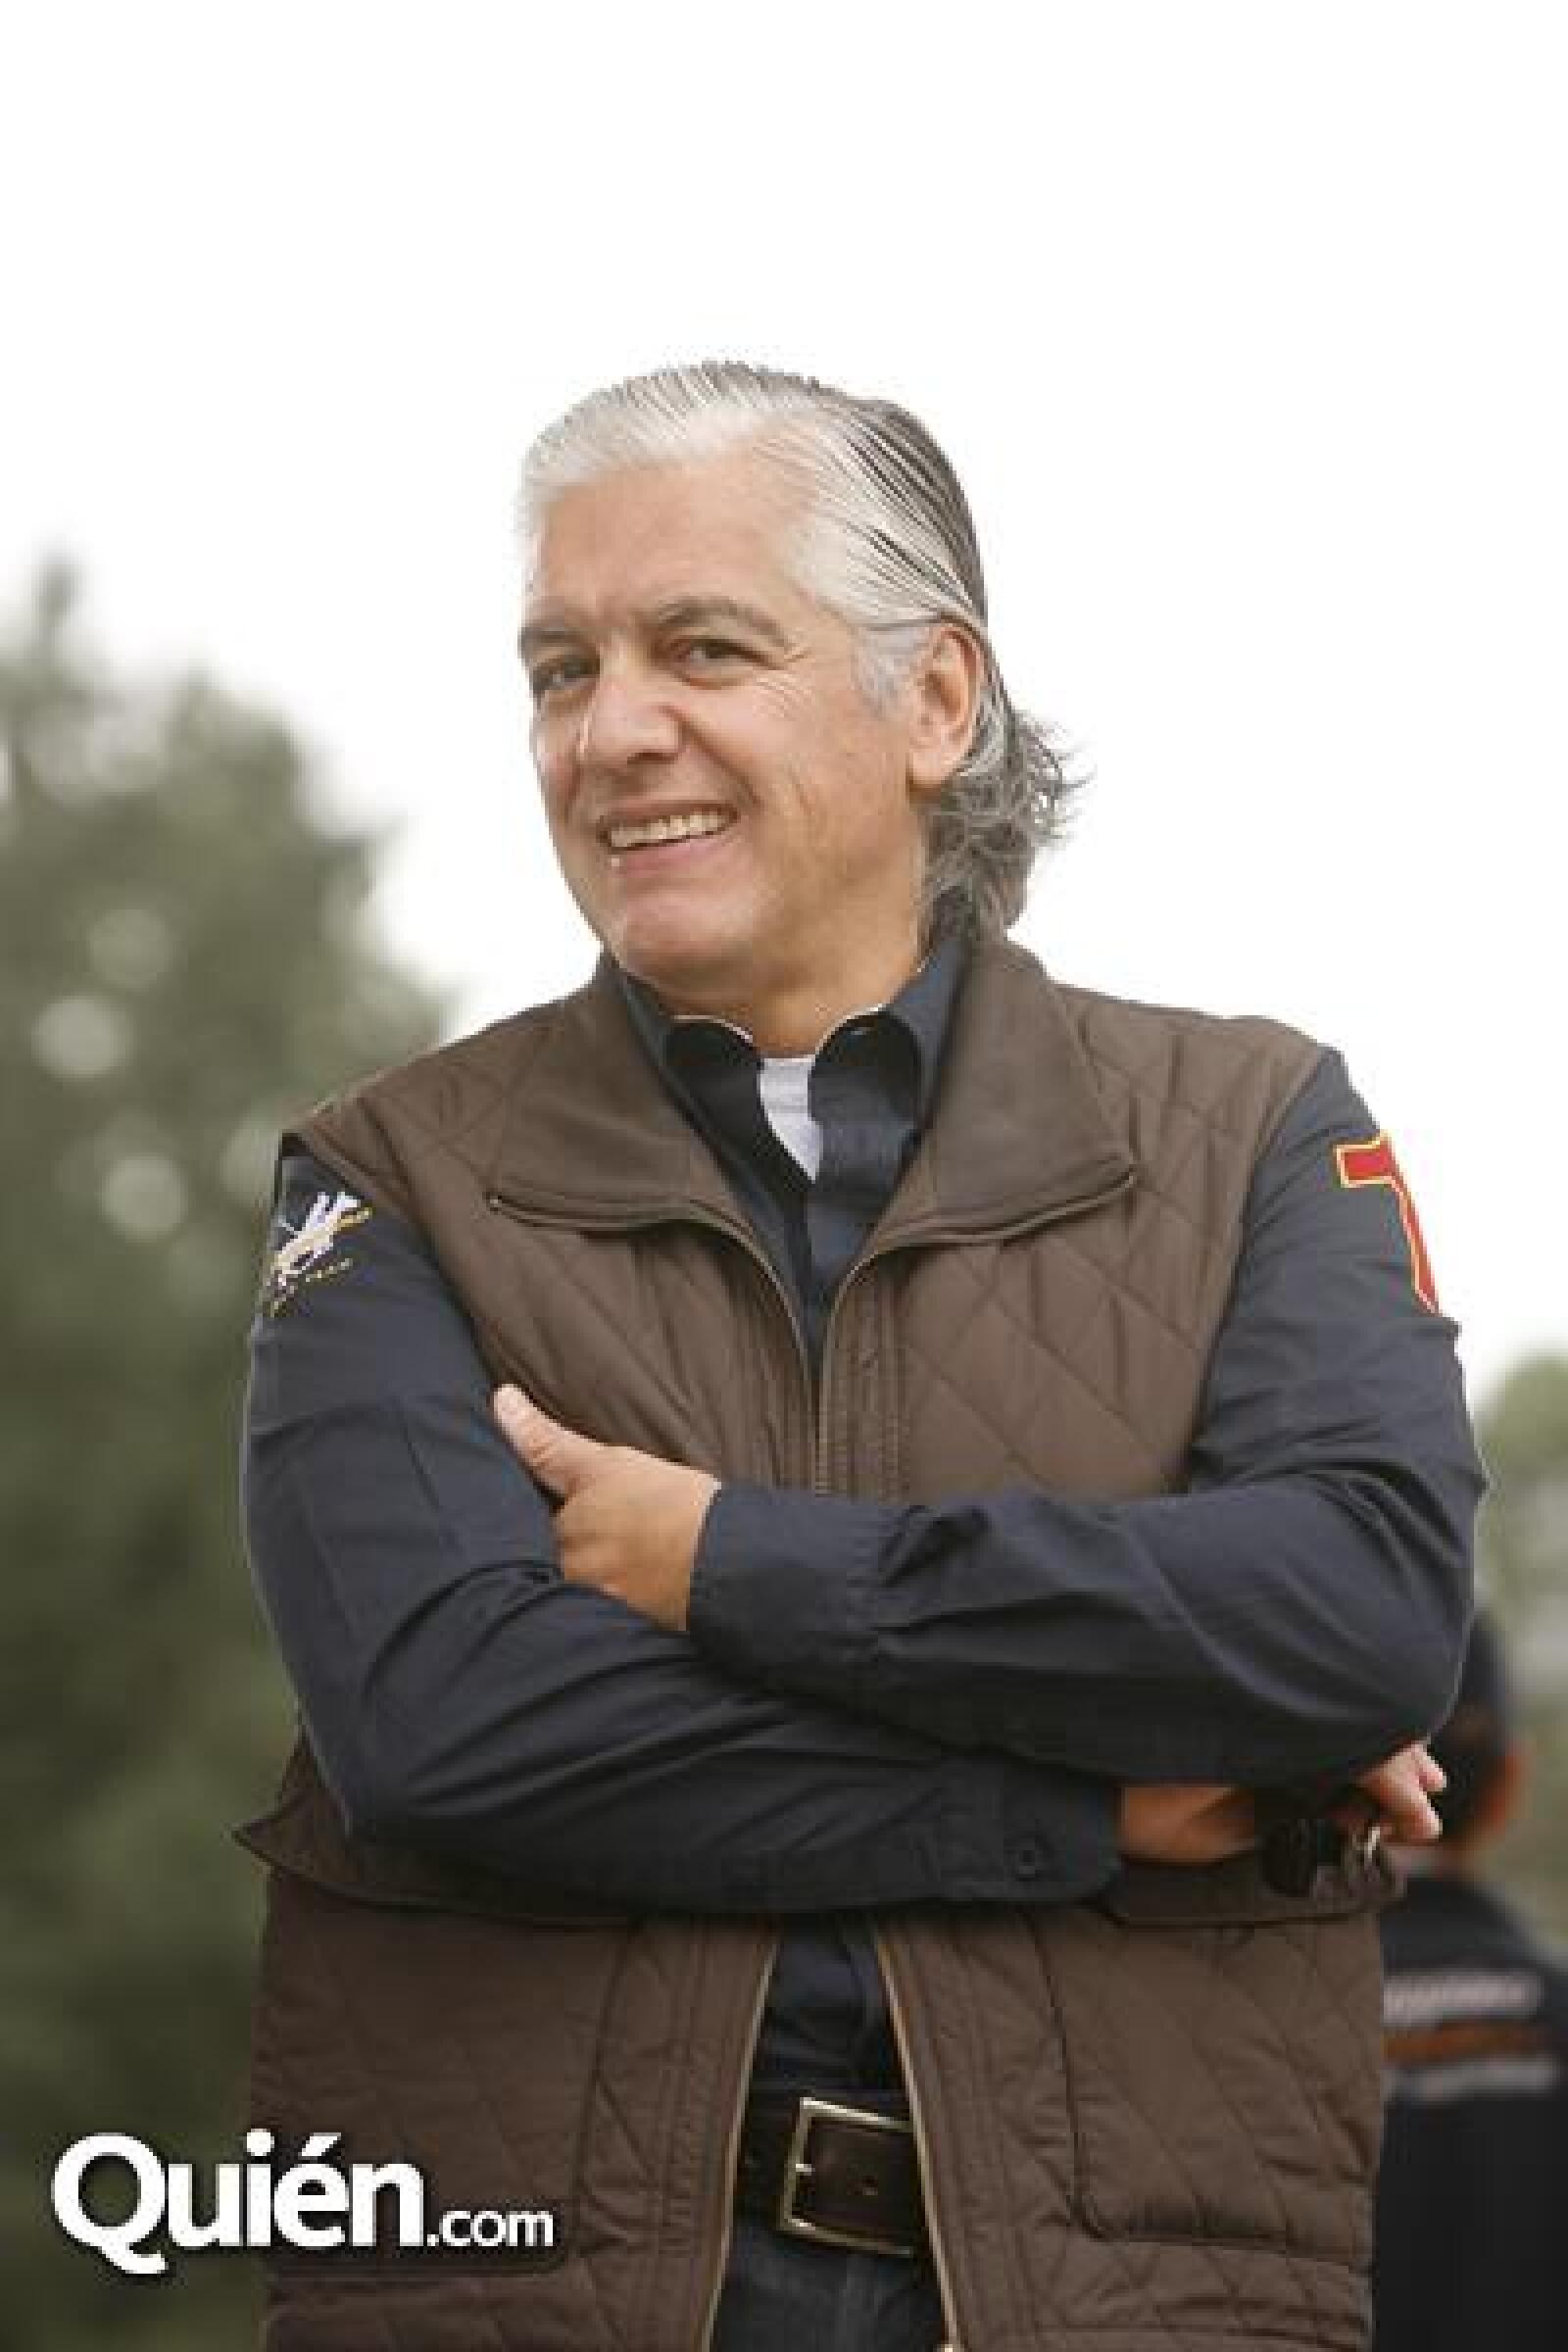 Antonio Orestano